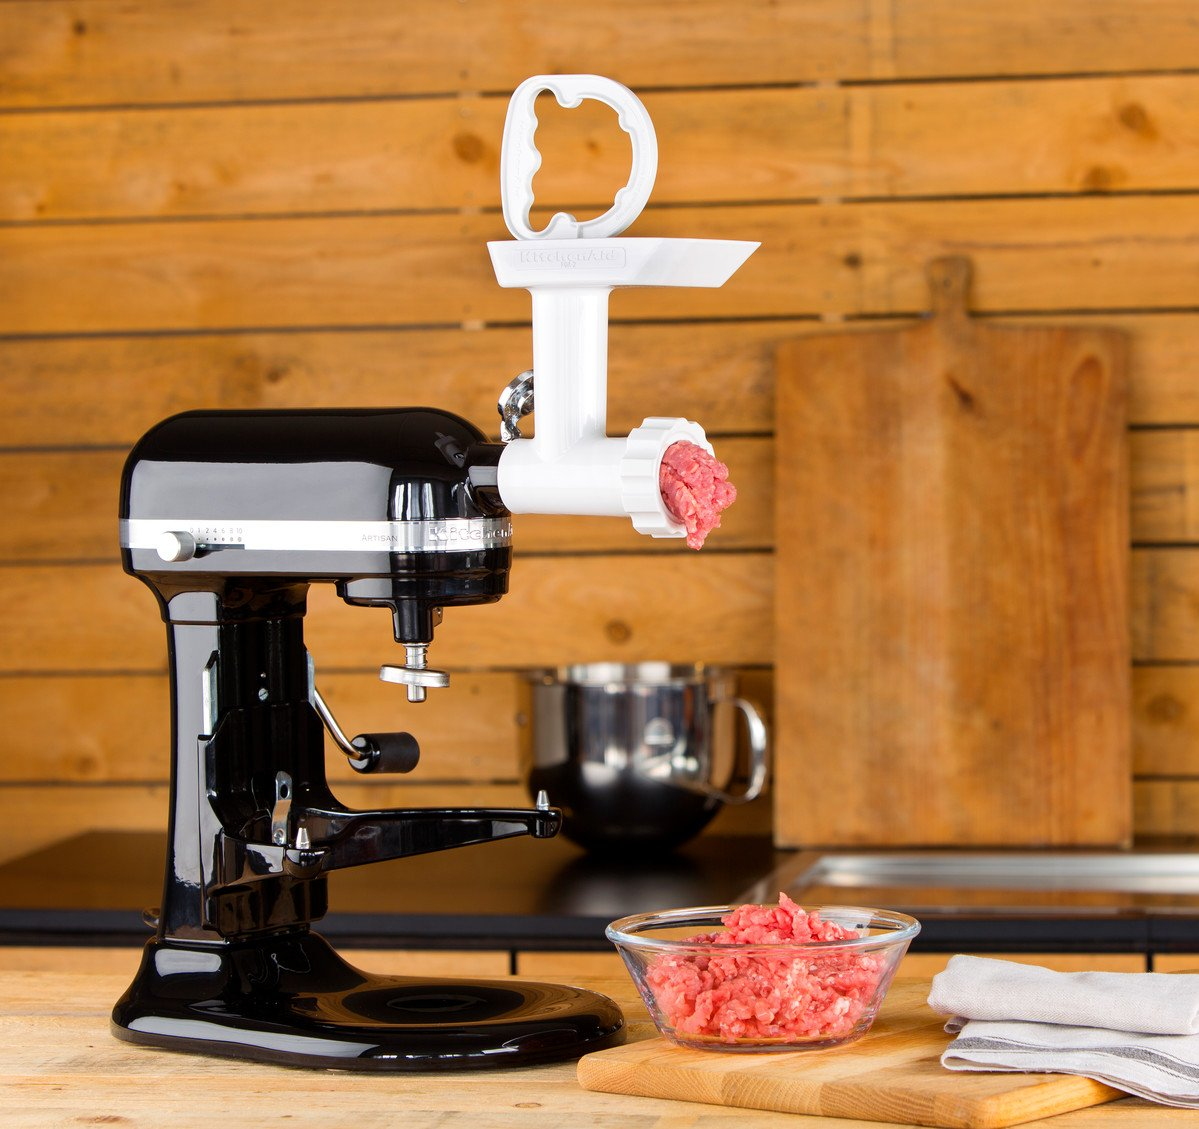 KitchenAid FGA Food Grinder Attachment by KitchenAid (Image #11)